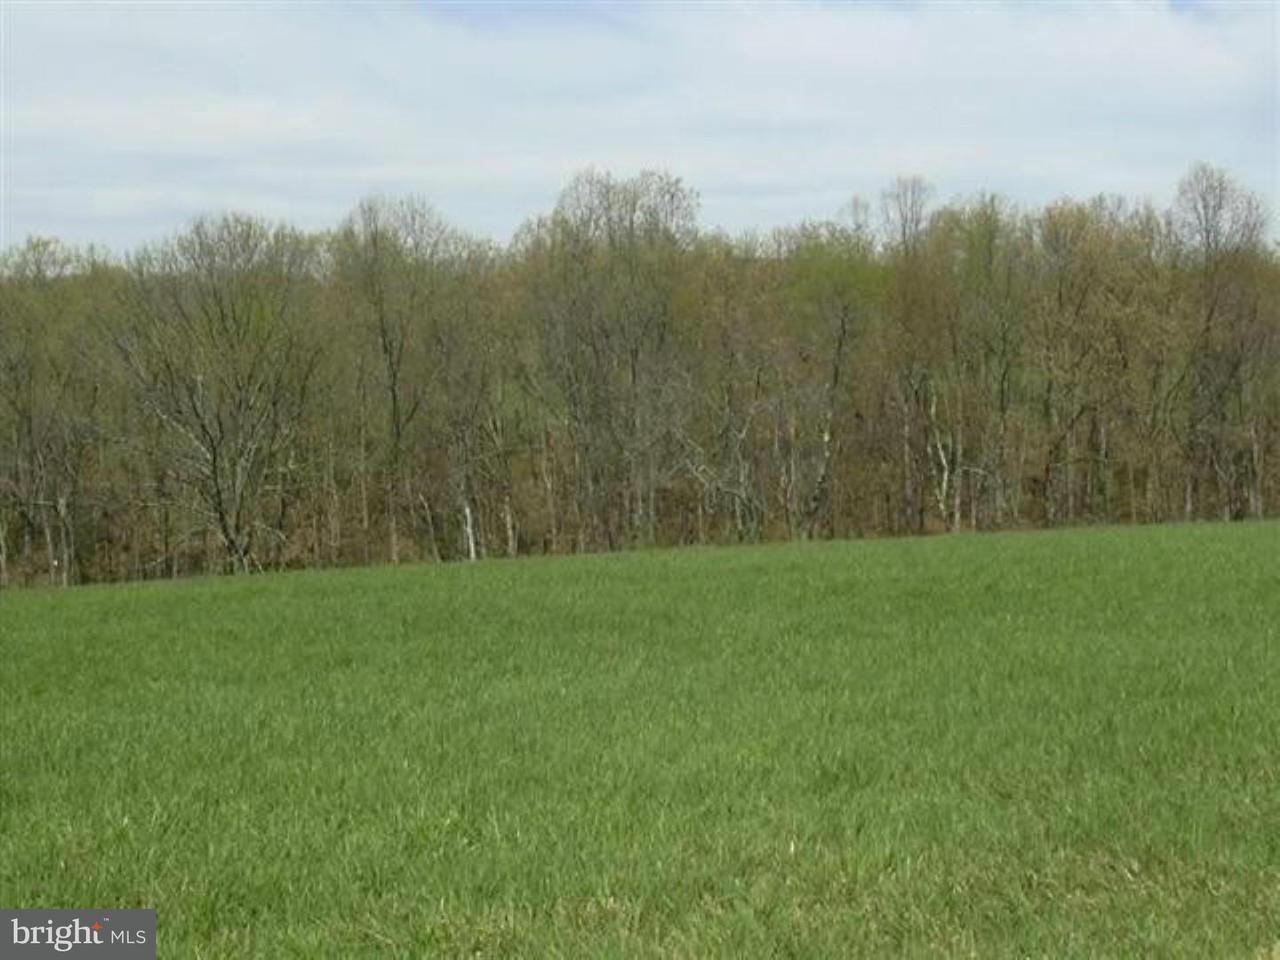 Land for Sale at 61 Sleepy Knolls Shanks, West Virginia 26761 United States